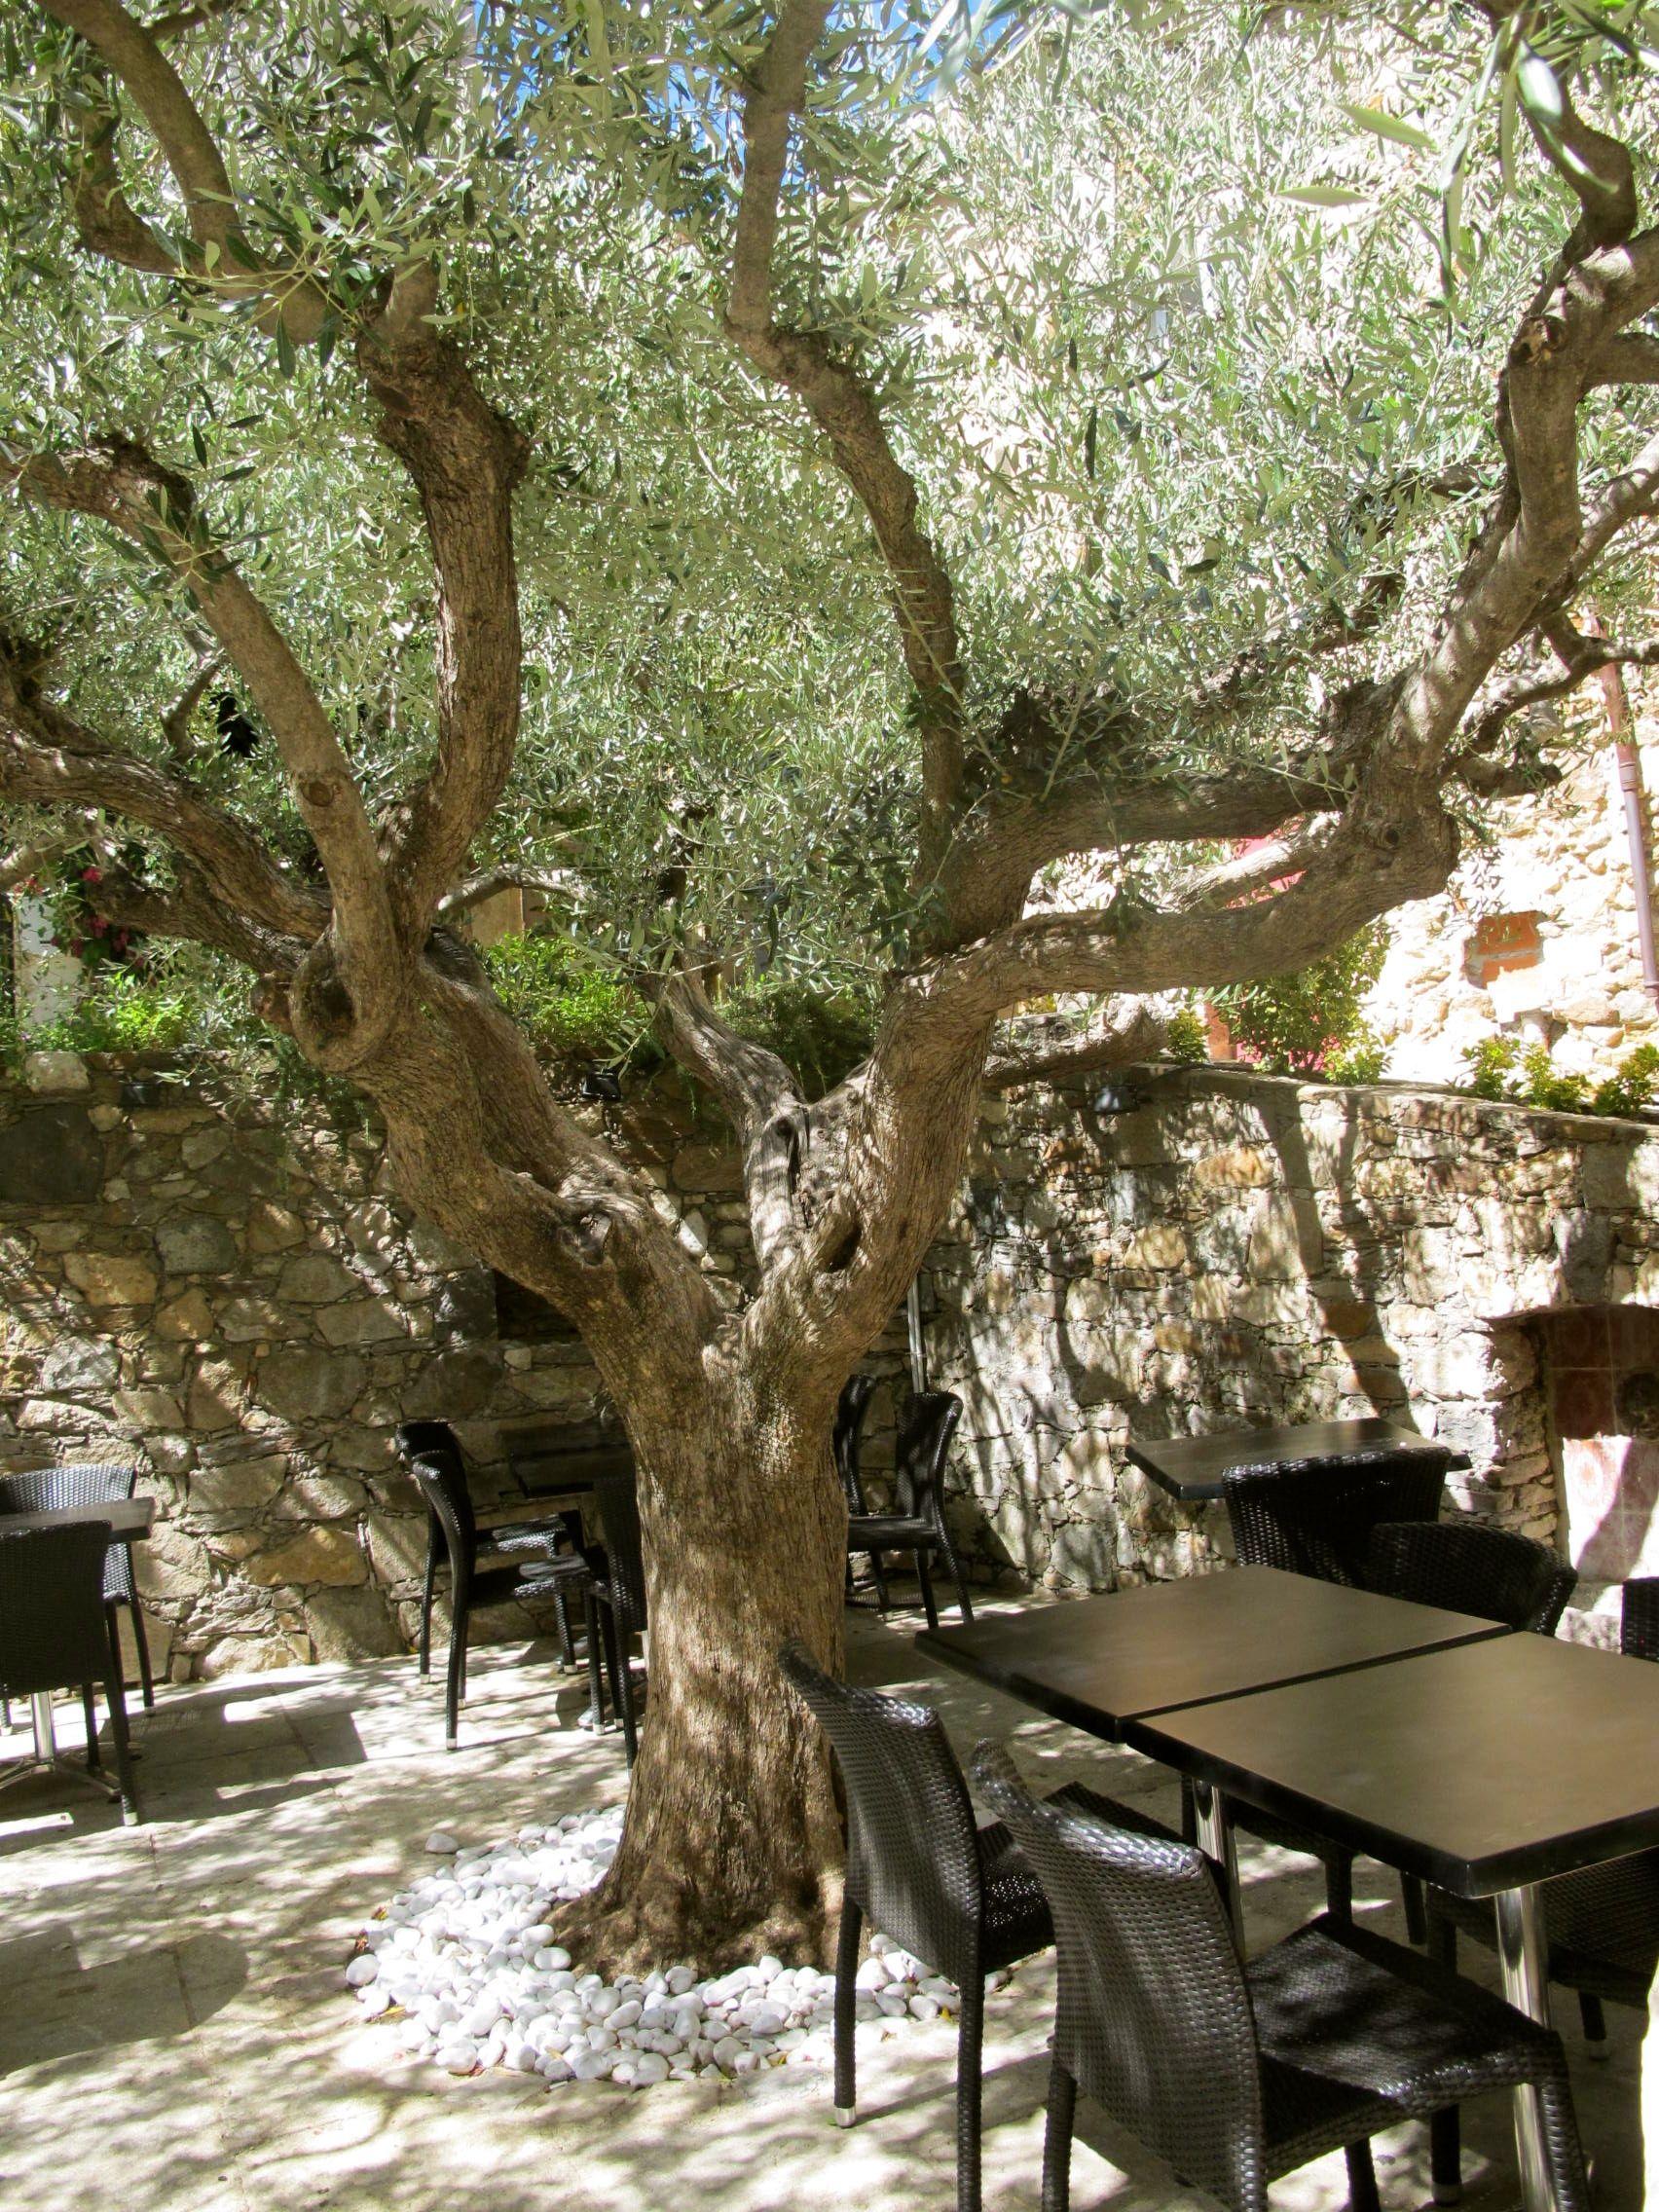 Port Grimaud, France. French Hilltop Village, Olive Trees